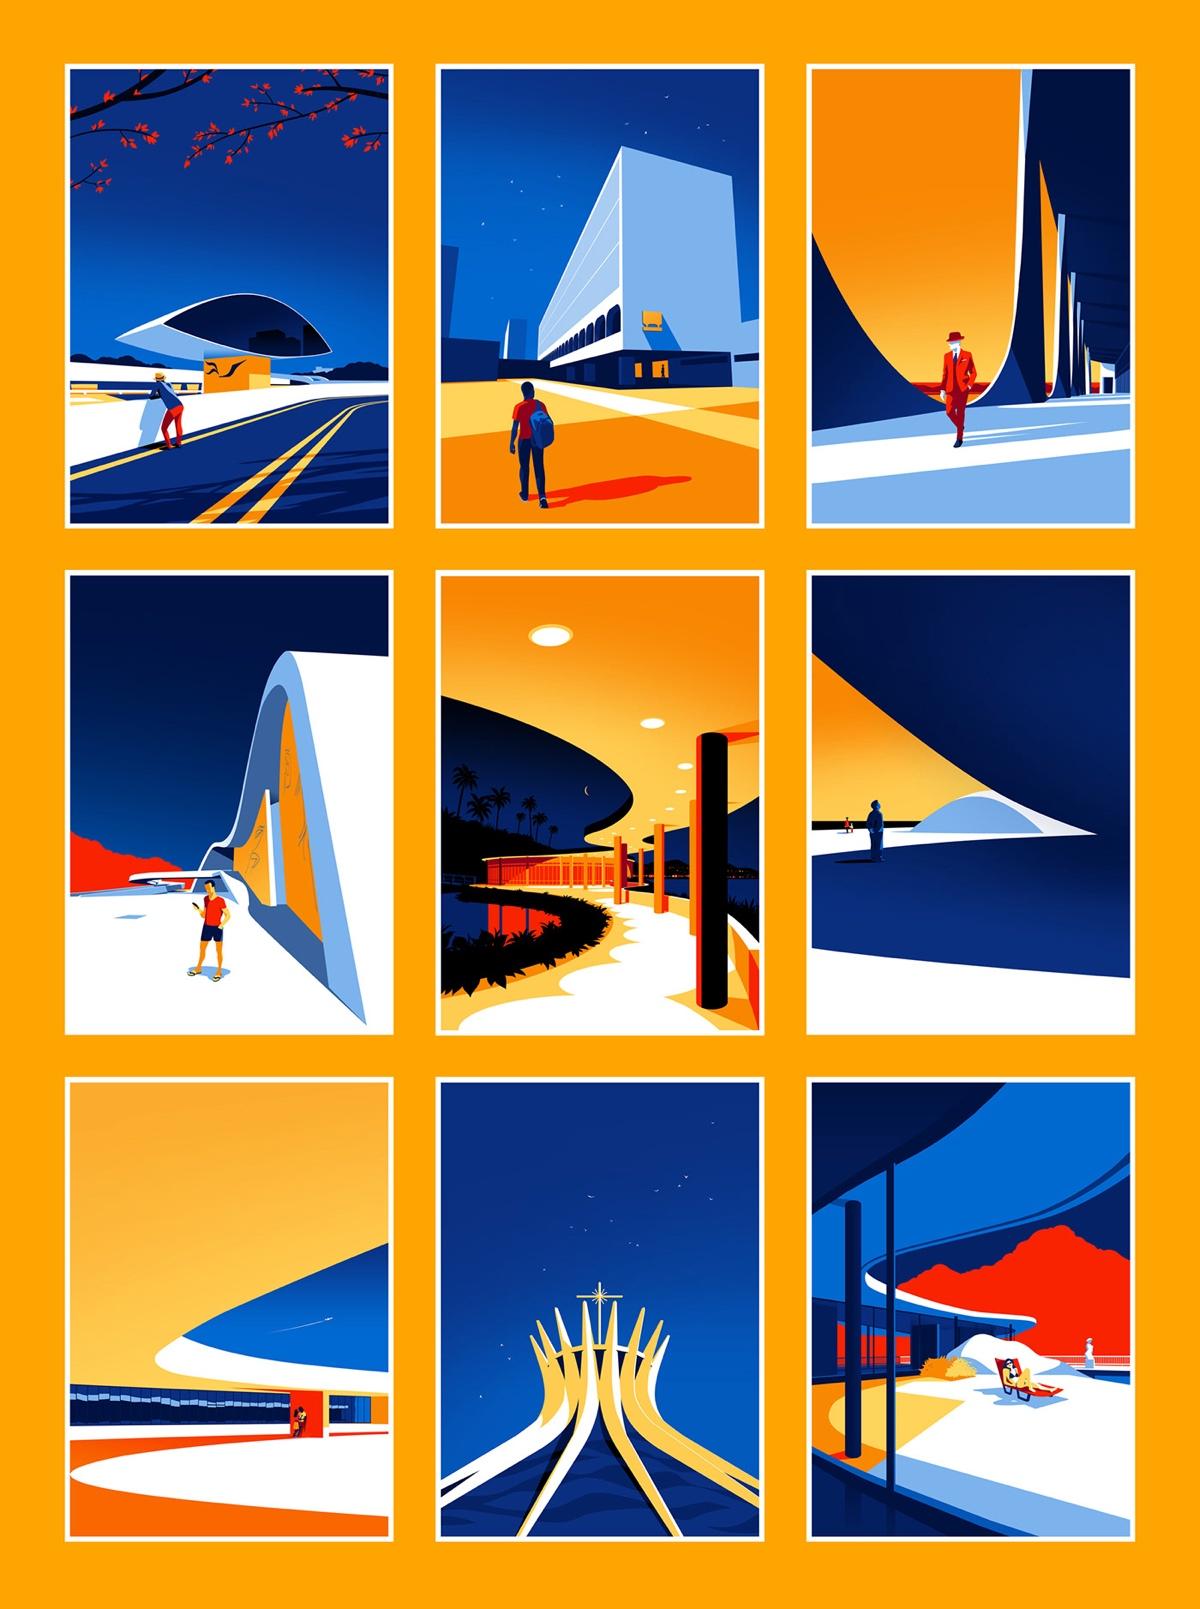 oscar-niemeyer-architecture-illustrations-levente-szabo-8